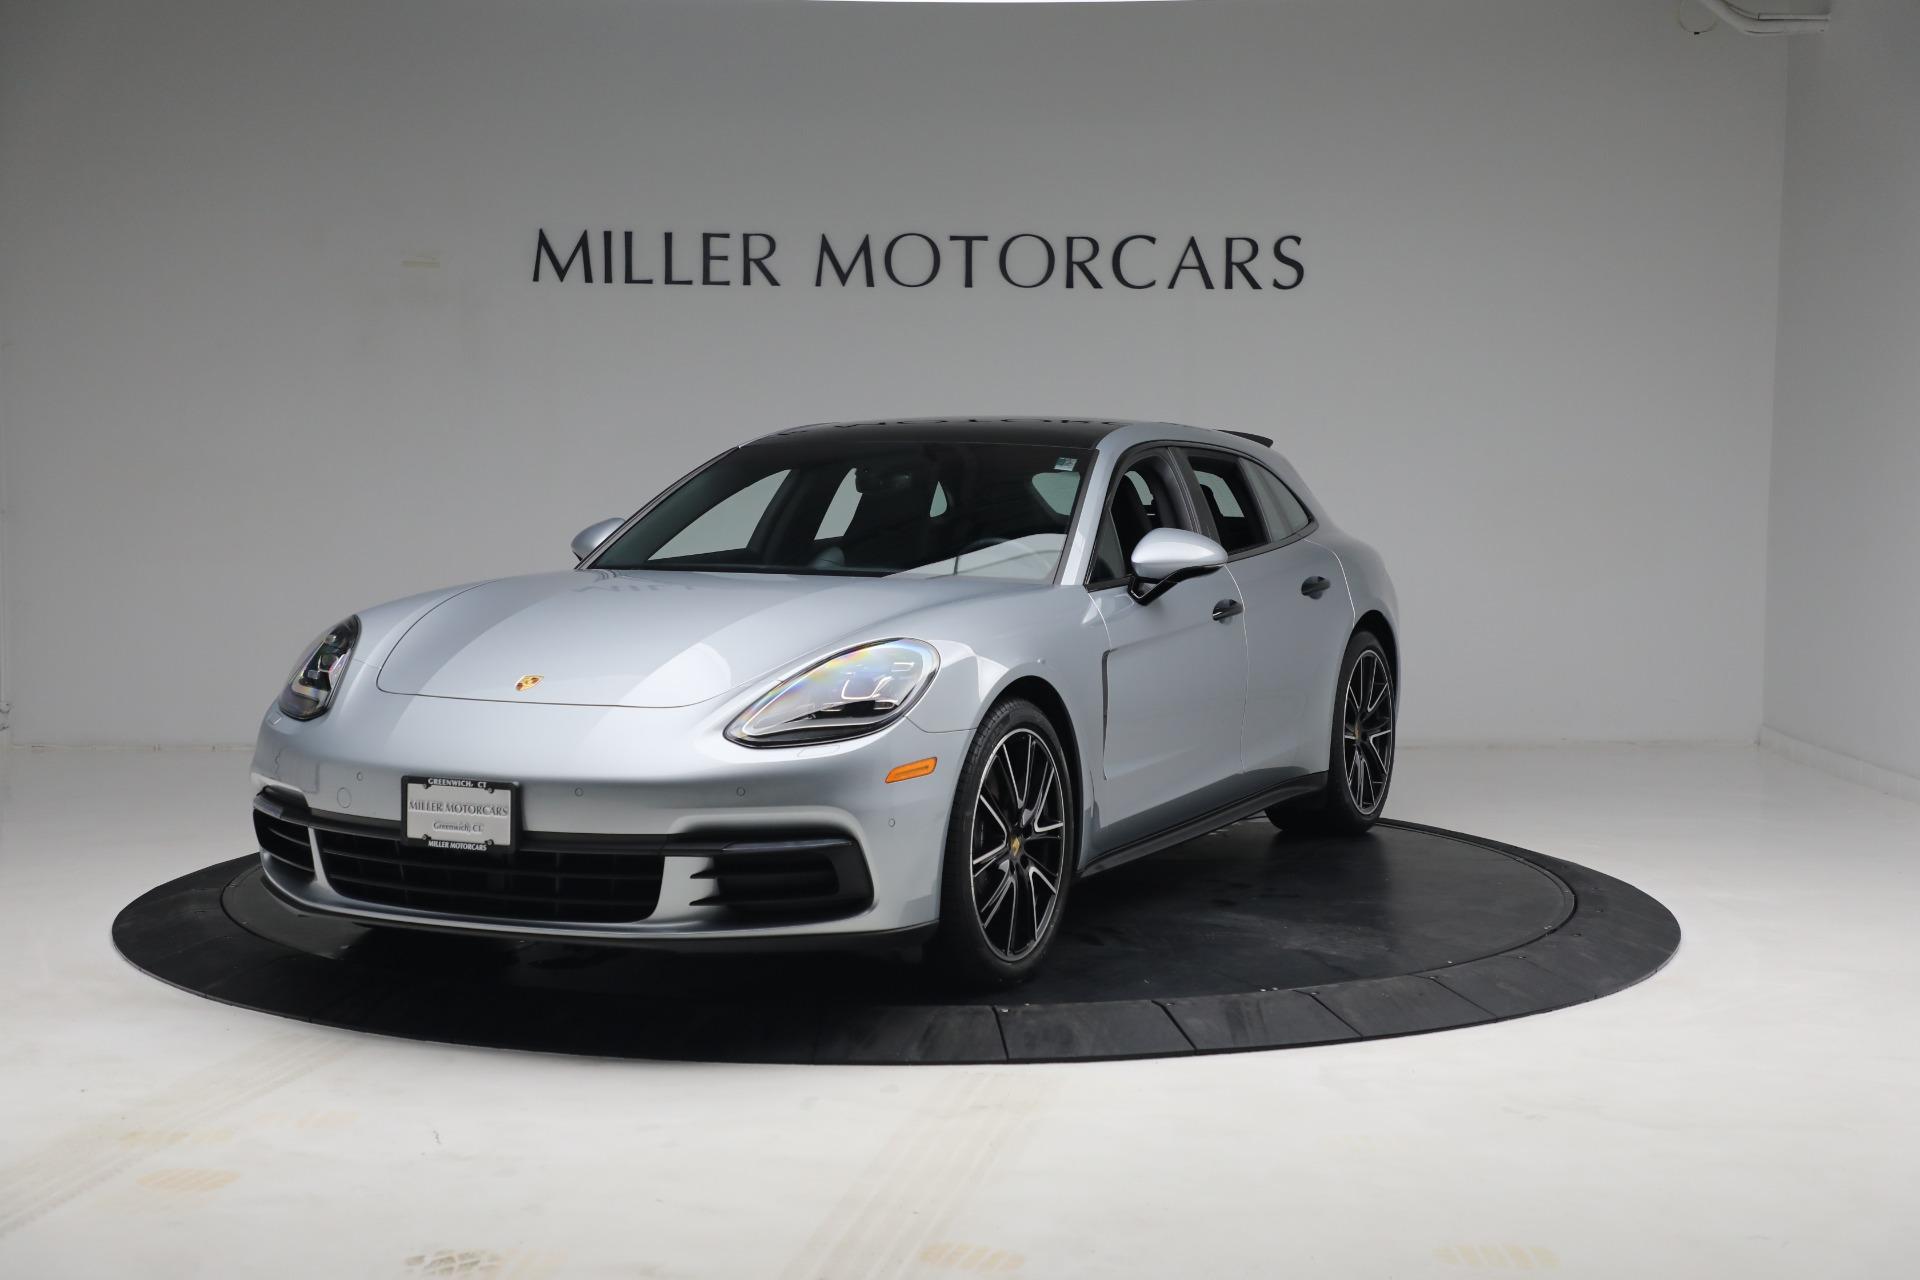 Used 2018 Porsche Panamera 4 Sport Turismo for sale $97,900 at McLaren Greenwich in Greenwich CT 06830 1